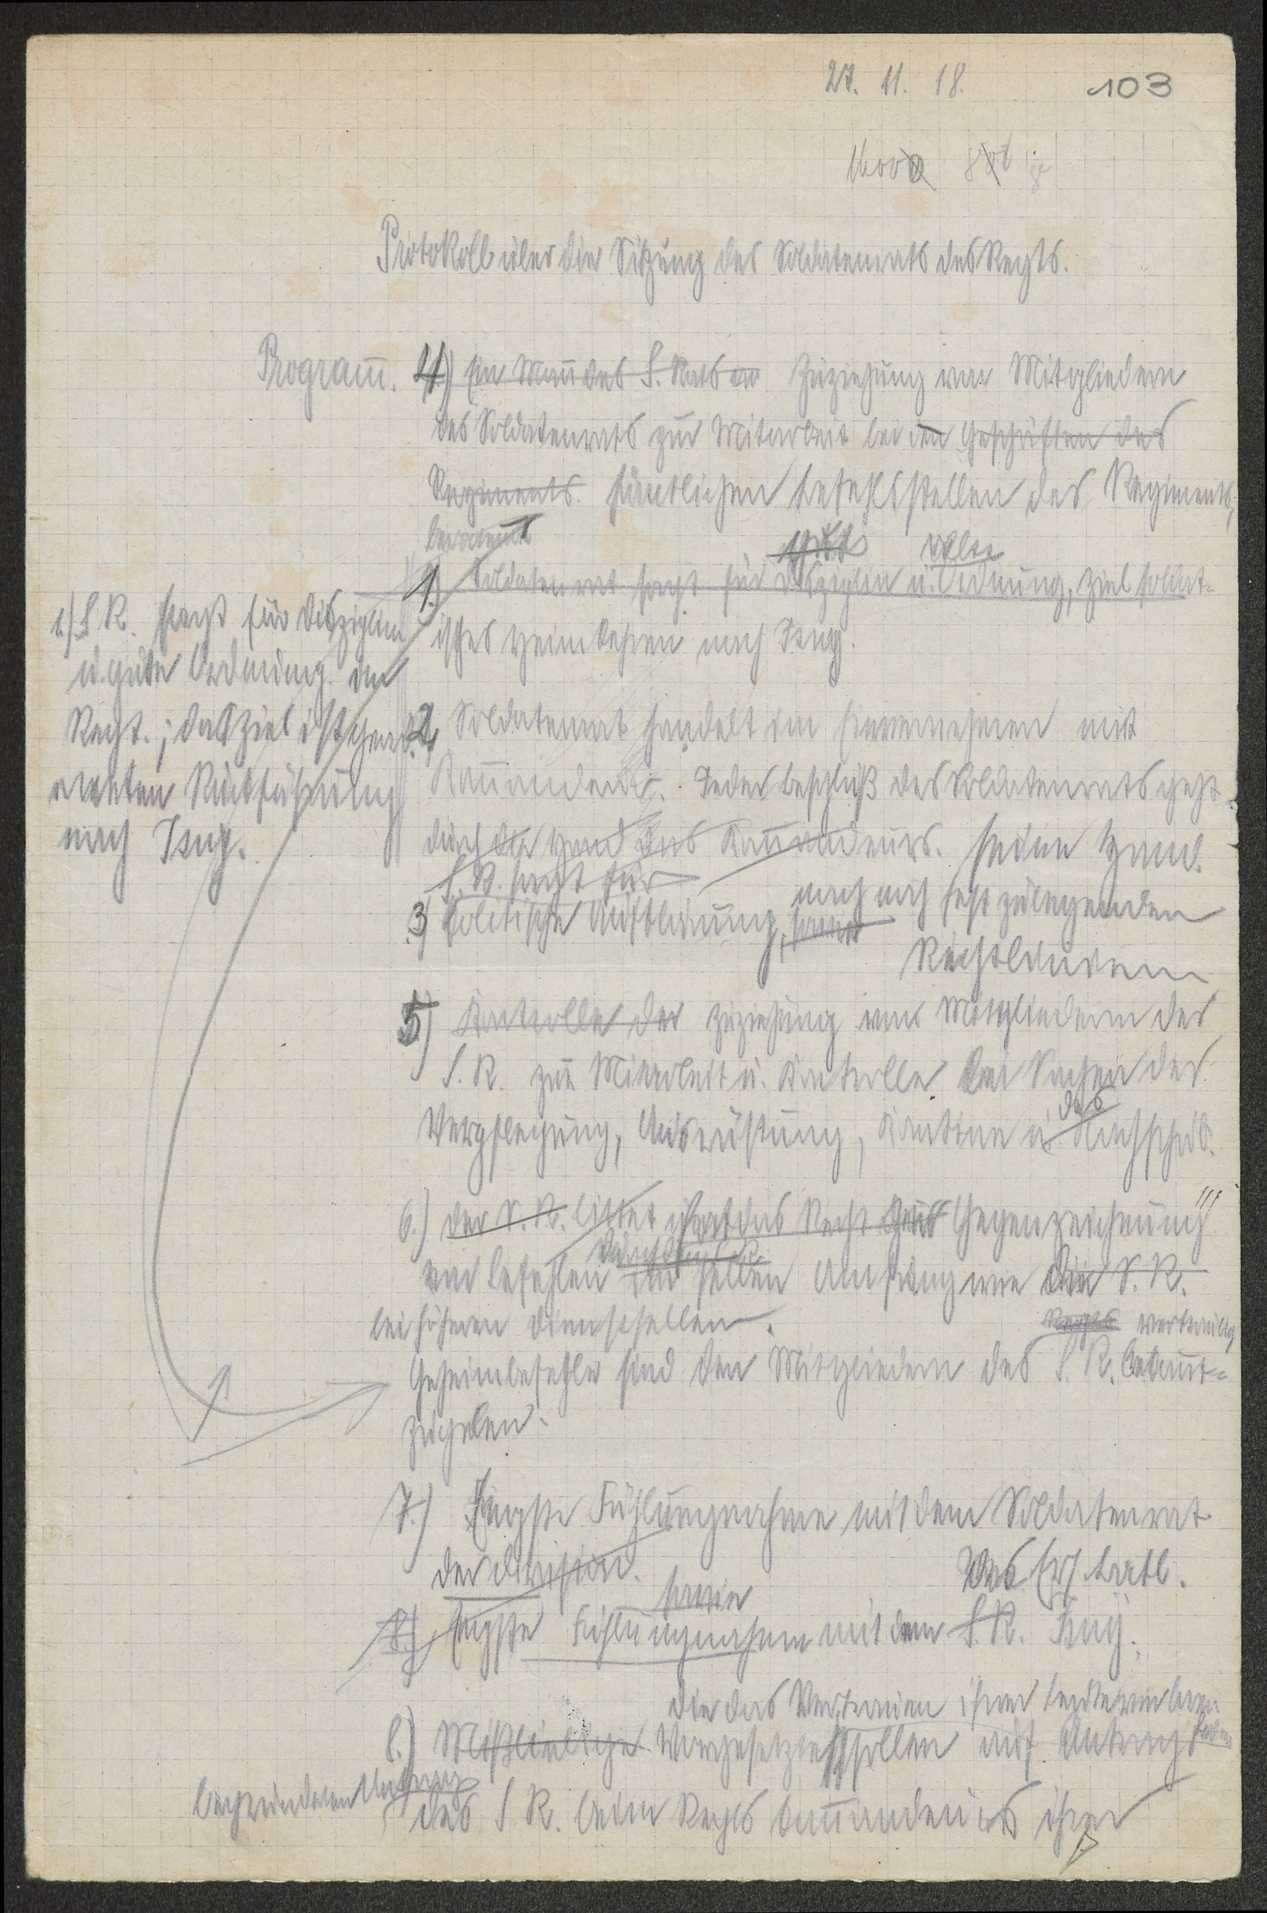 Sitzungsprotokolle des Soldatenrats des (Feld-)Gebirgsregiments, Bild 1